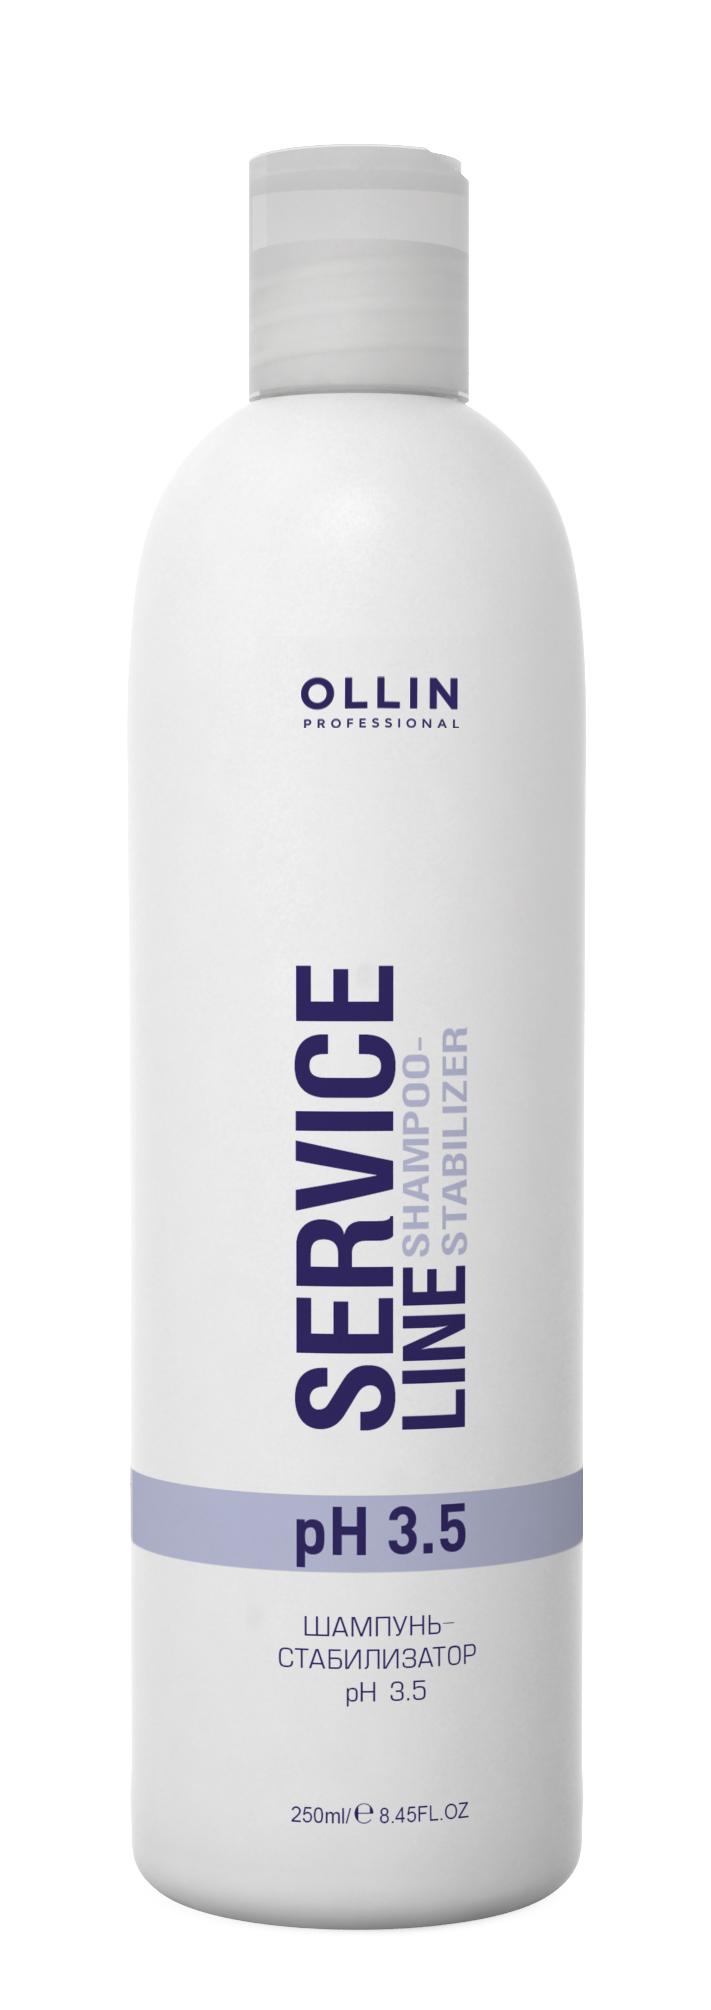 Ollin Шампунь-стабилизатор рН 3.5 Service Line Shampoo-Stabilizer Ph 3.5 250 мл ollin professional service line протектор для эащиты кожи головы scalp protector 12 2 мл